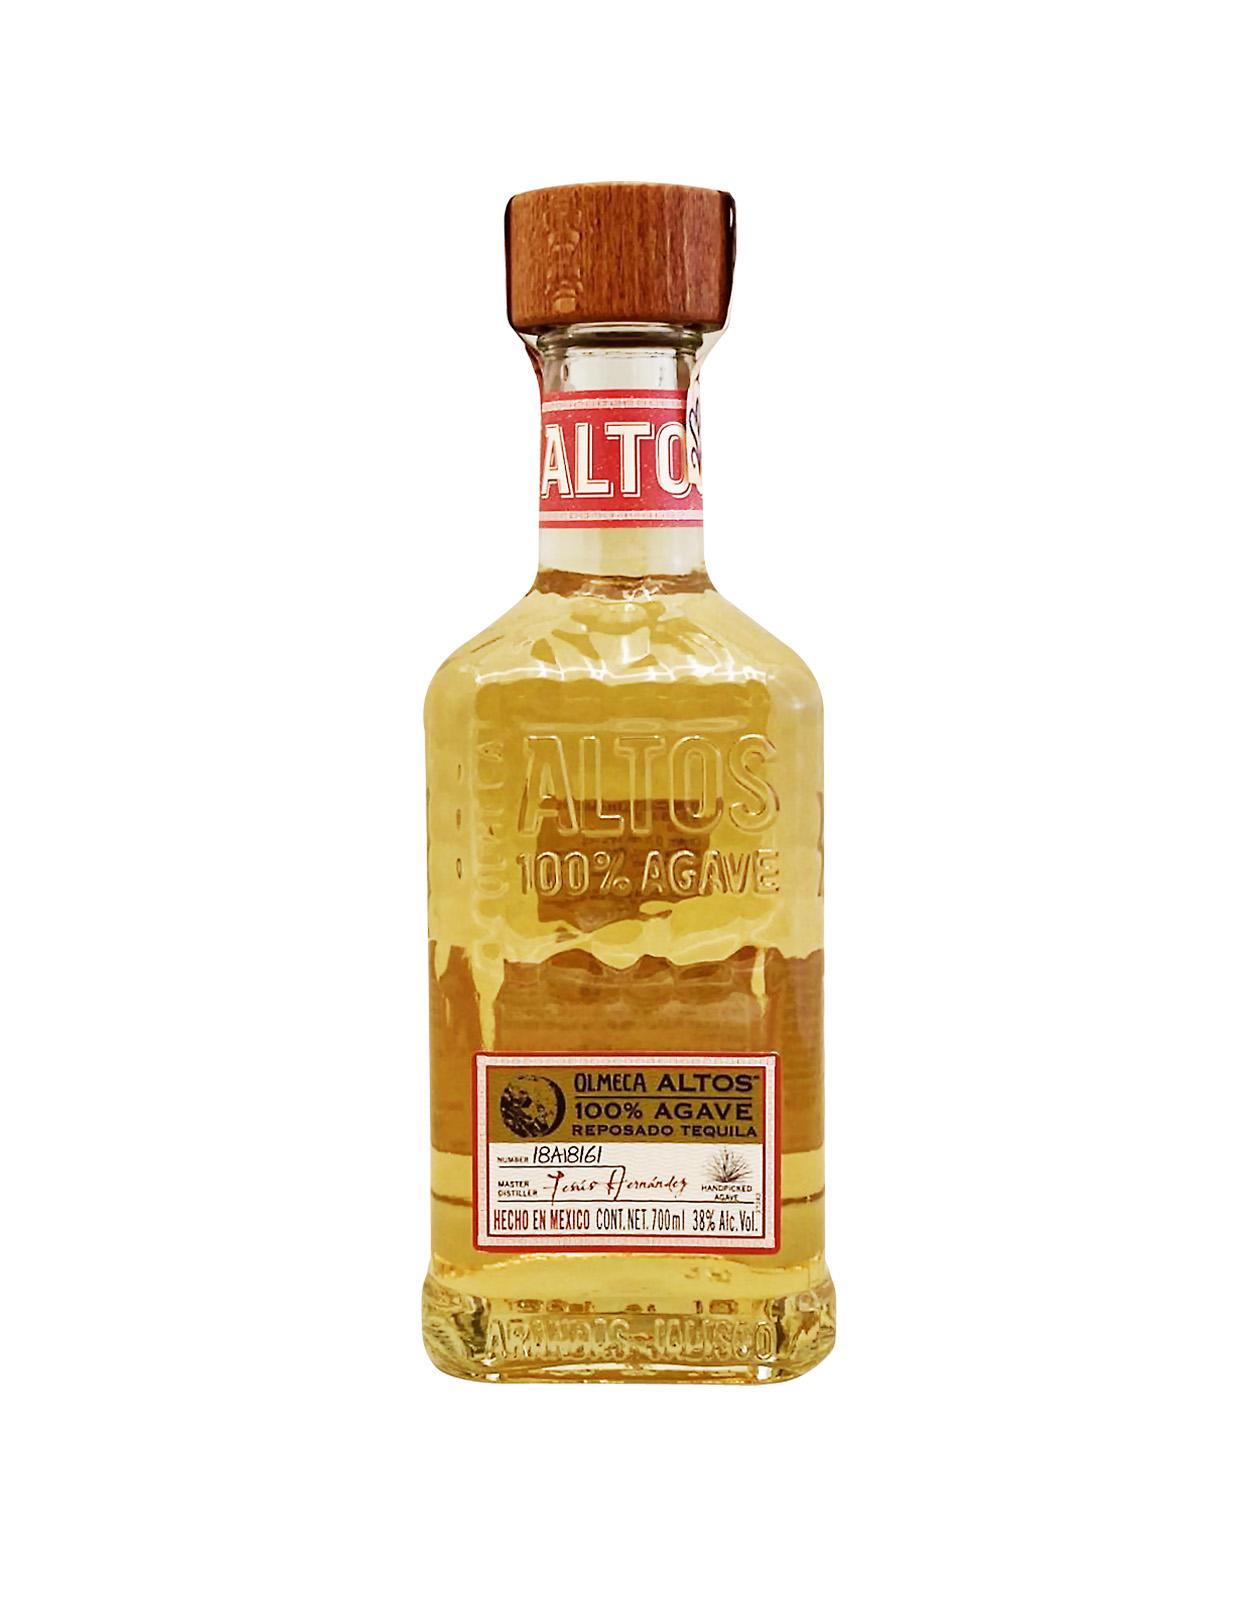 Olmeca Altos Reposado 38%, Bottleshop Sunny wines slnecnice mesto, petrzalka, Tequila, rozvoz alkoholu, eshop